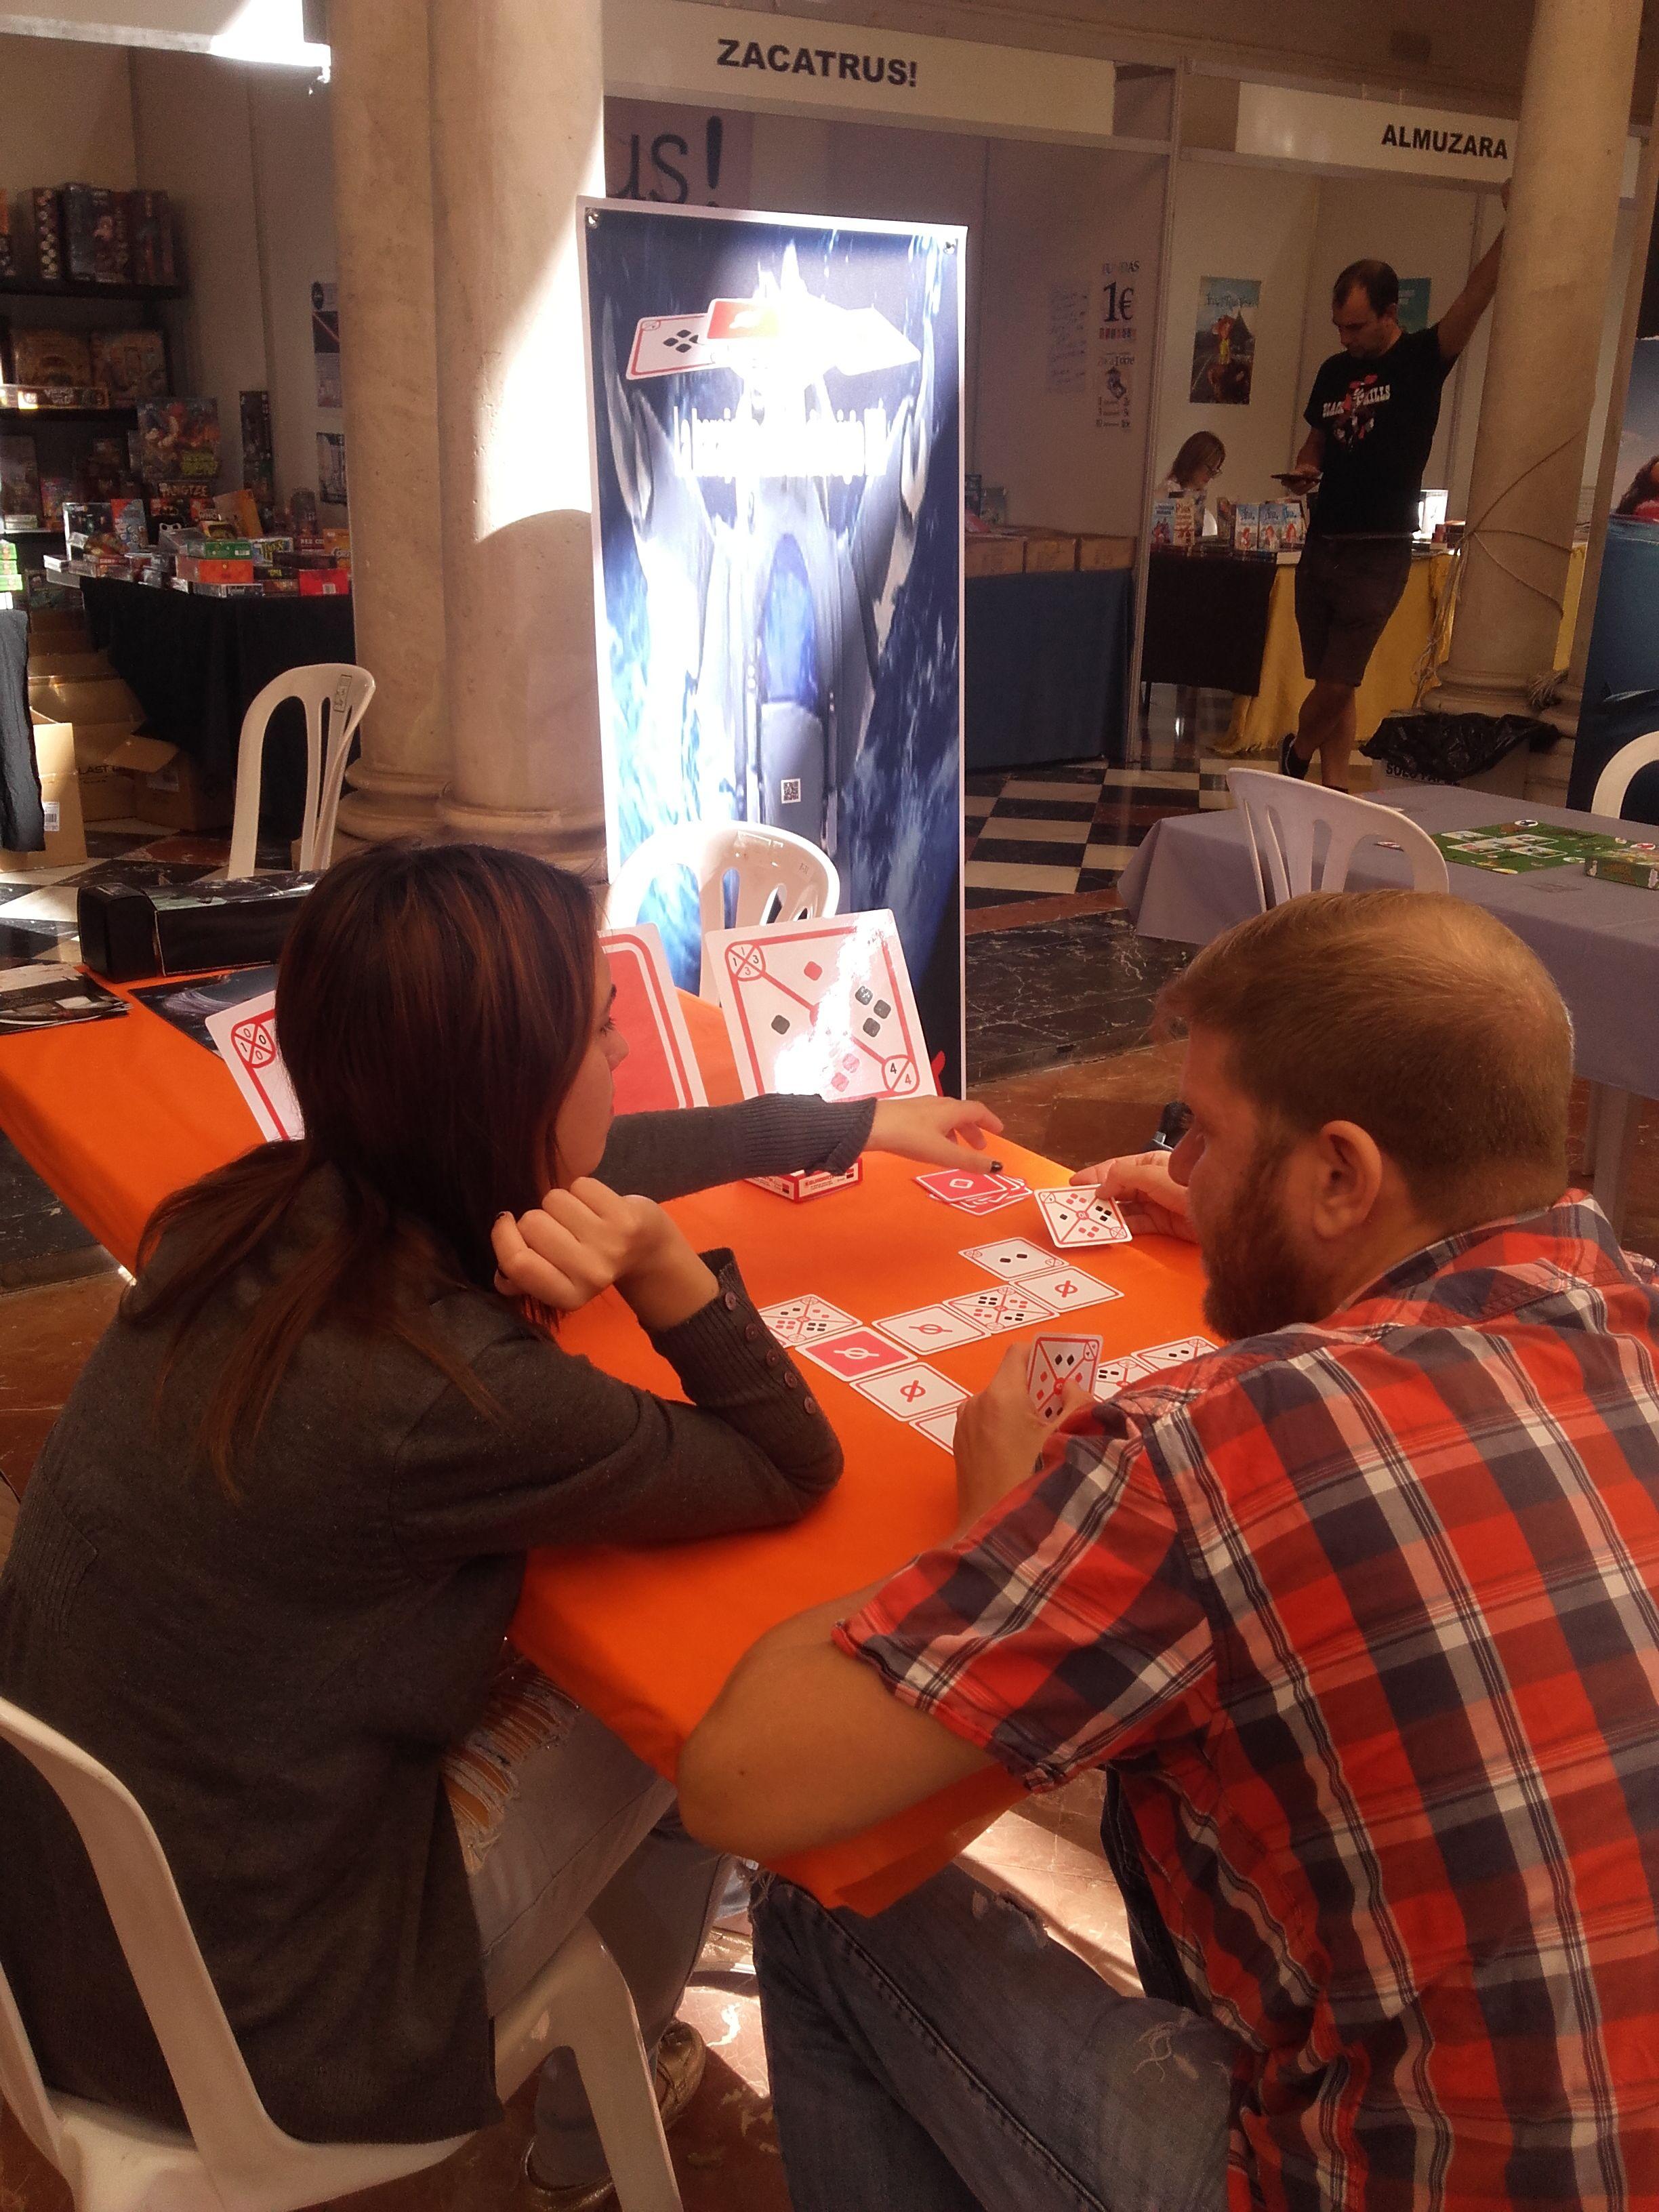 #festivalinternacionaldecordoba invitado por @ESTALIA_CORDOBA mañana dia 14 de 11,15 a 13,30 horas #juegosdemesa #boardgames #dominó #cartas